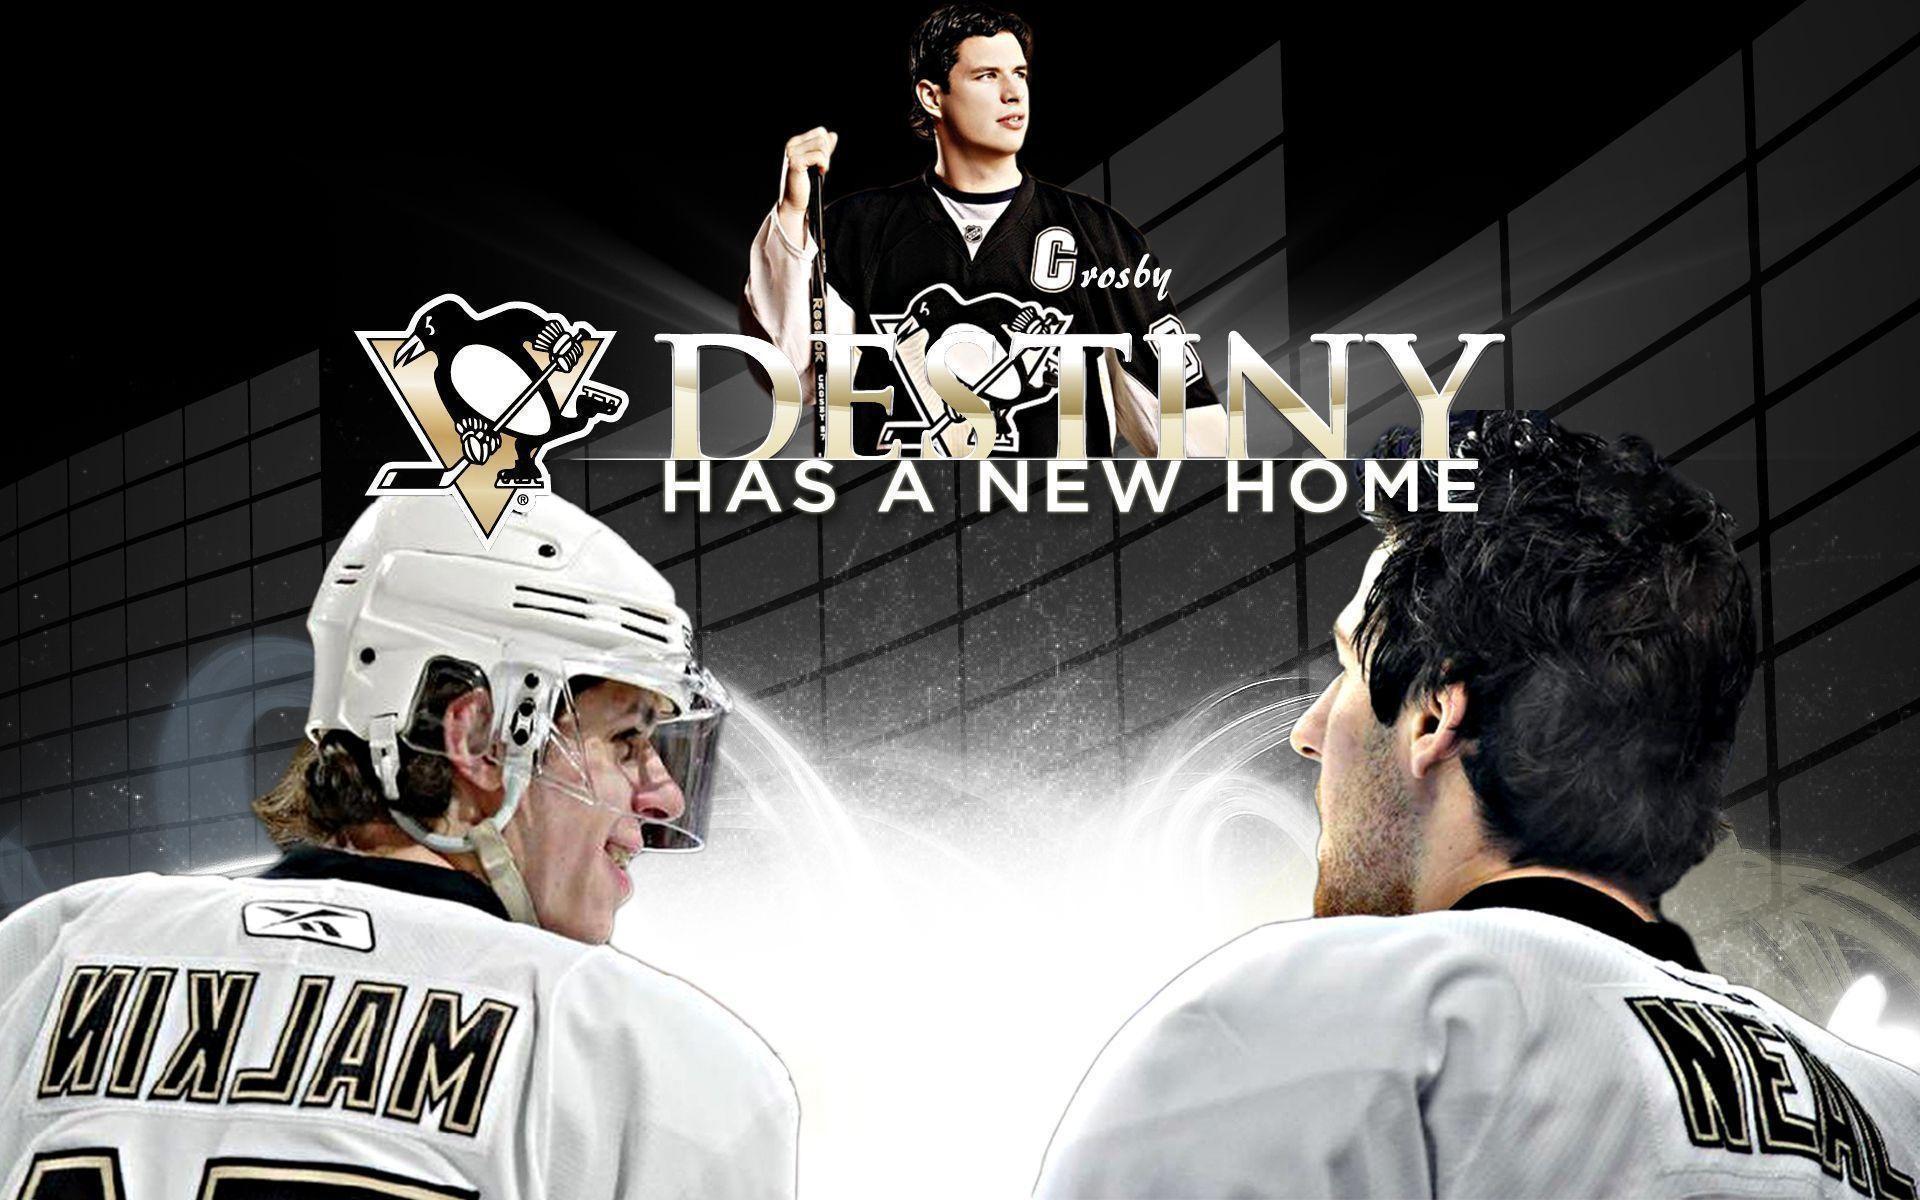 Free Pittsburgh Penguins desktop wallpaper | Pittsburgh Penguins .